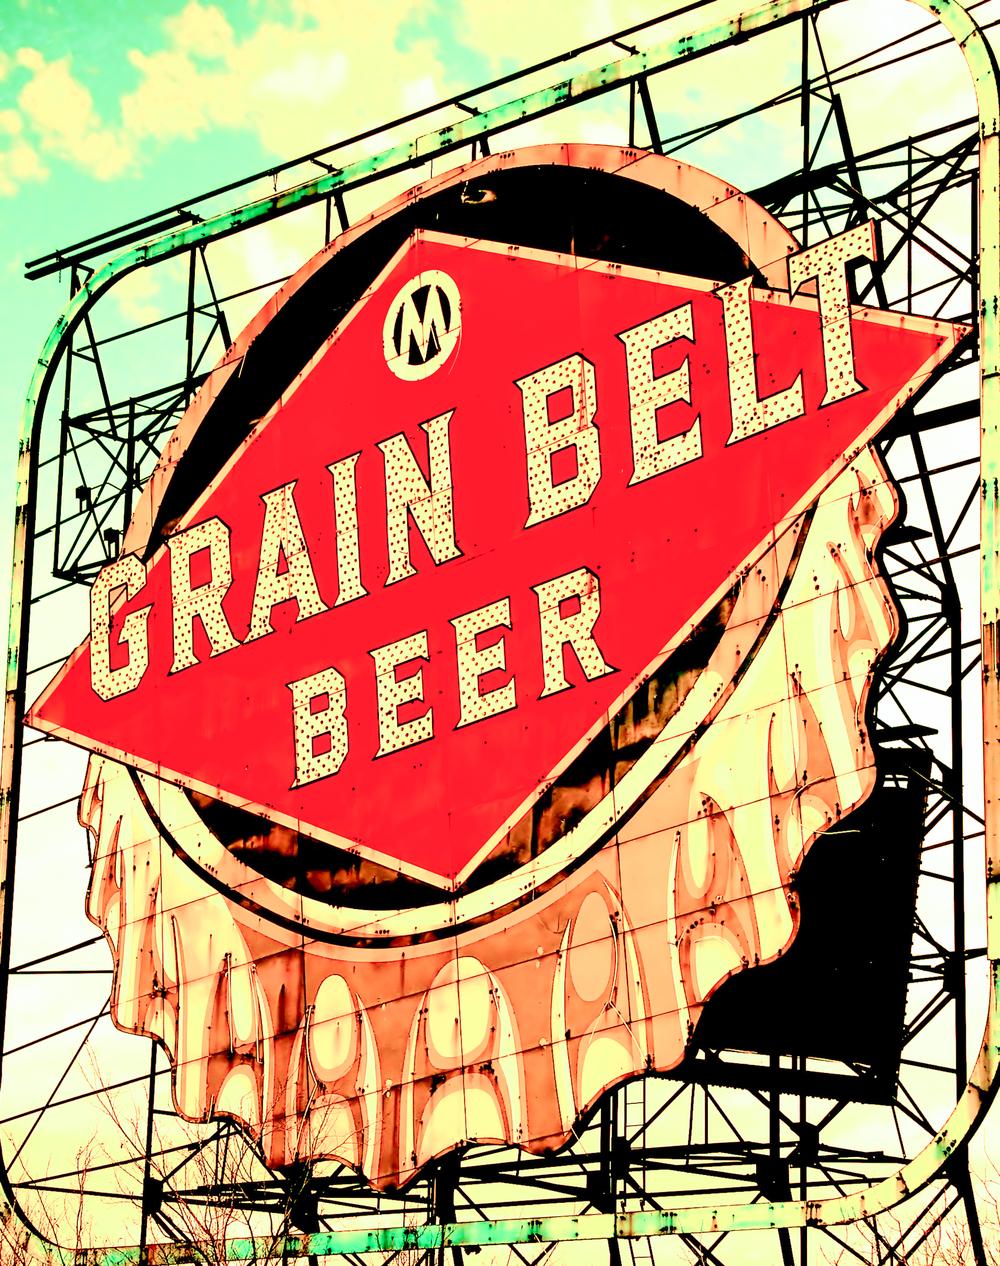 grainbelt (1 of 1).jpg